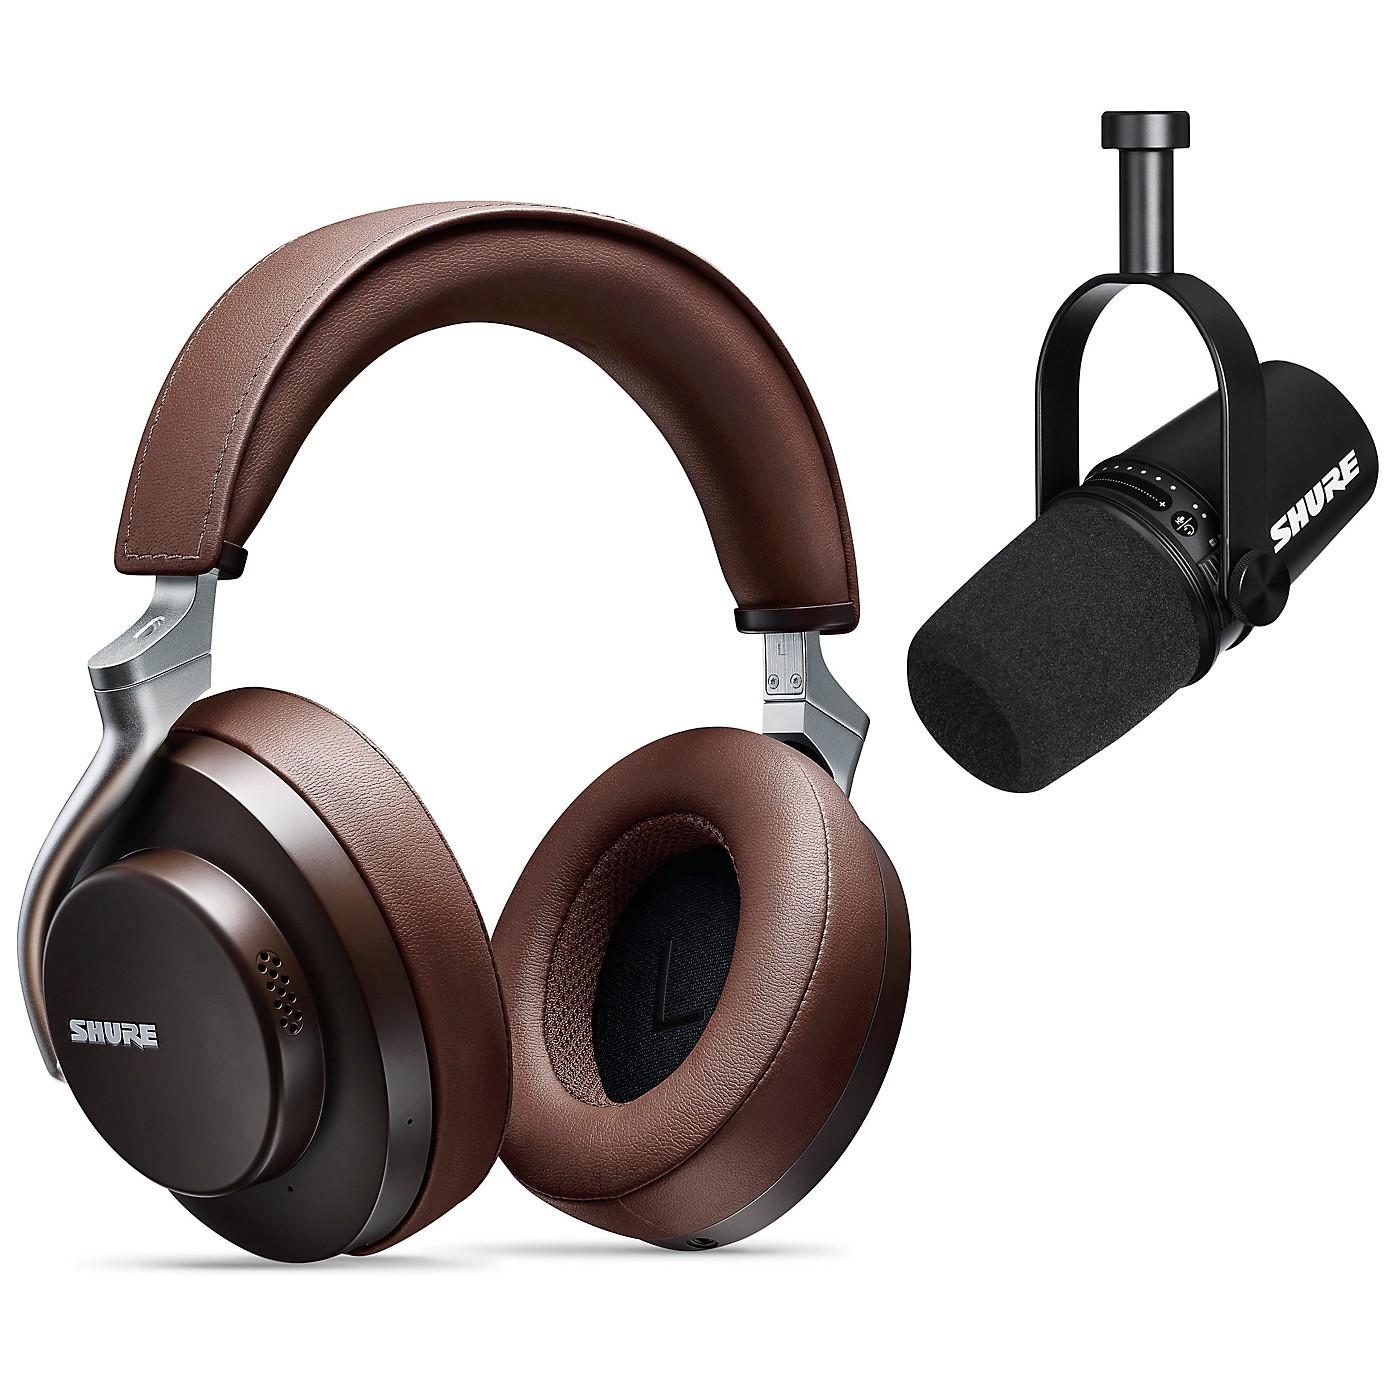 Shure MV7-K USB Microphone and AONIC 50 Headphones Content Creator Bundle thumbnail